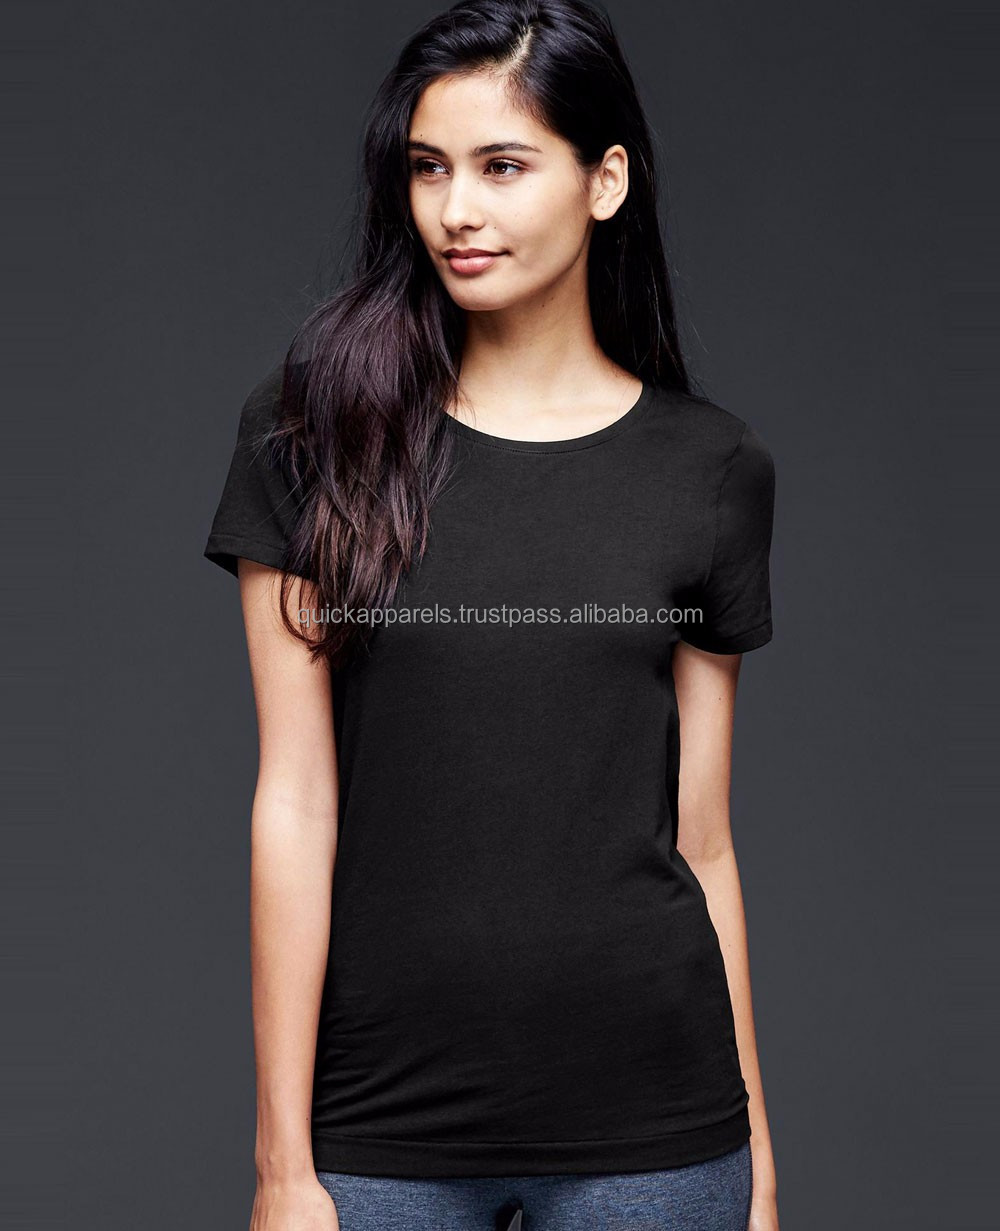 Plain black t shirt style - Cotton Slub Fabric T Shirts Cotton Slub Fabric T Shirts Suppliers And Manufacturers At Alibaba Com